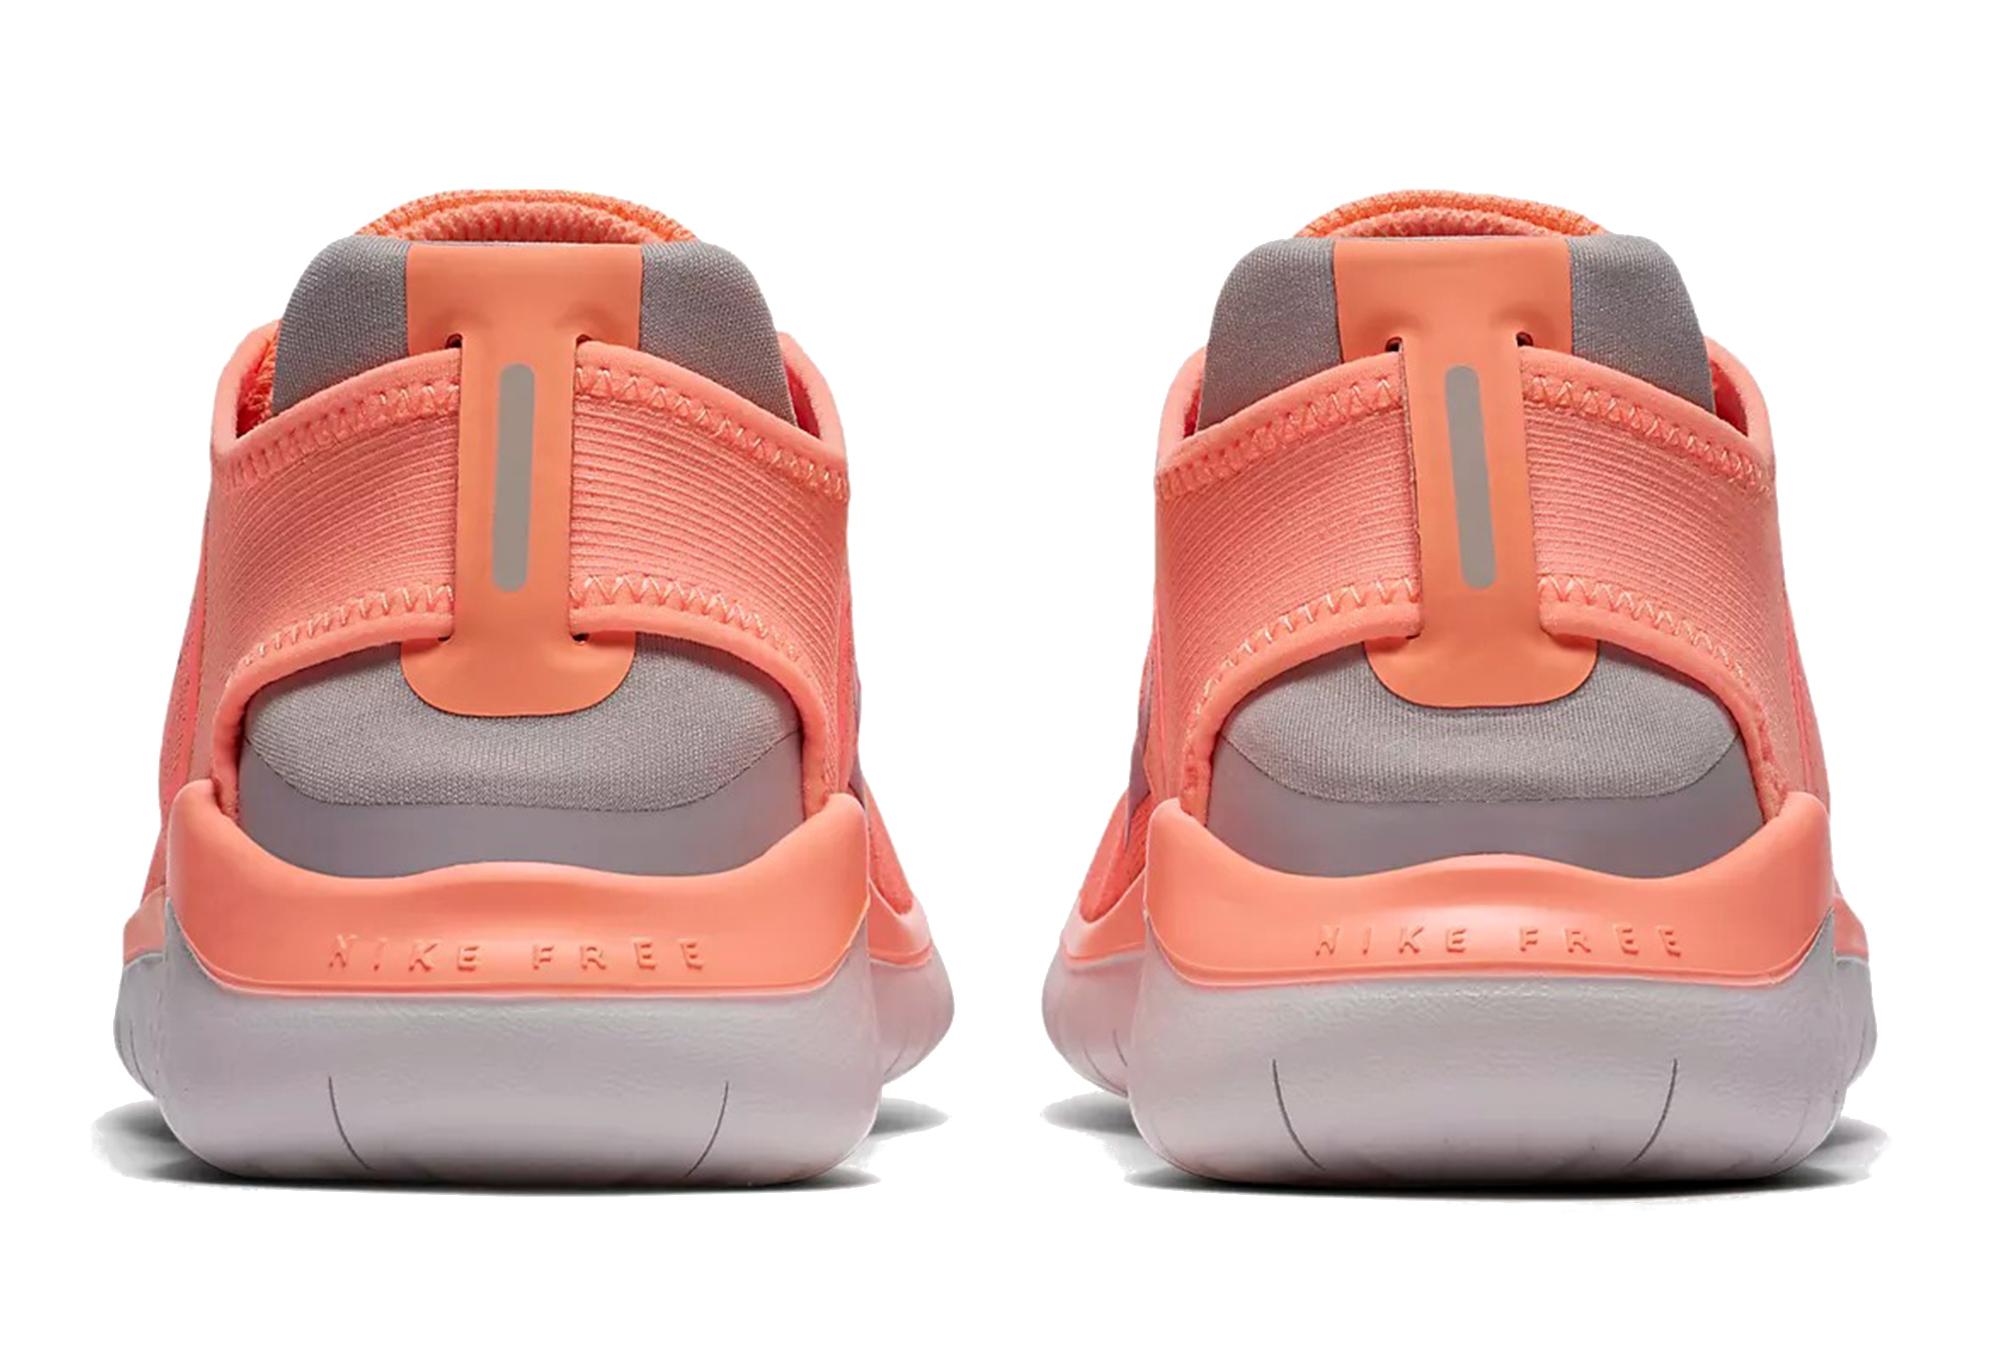 timeless design 2fb6e 1f099 Chaussures de Running Femme Nike Free RN 2018 Rose   Gris